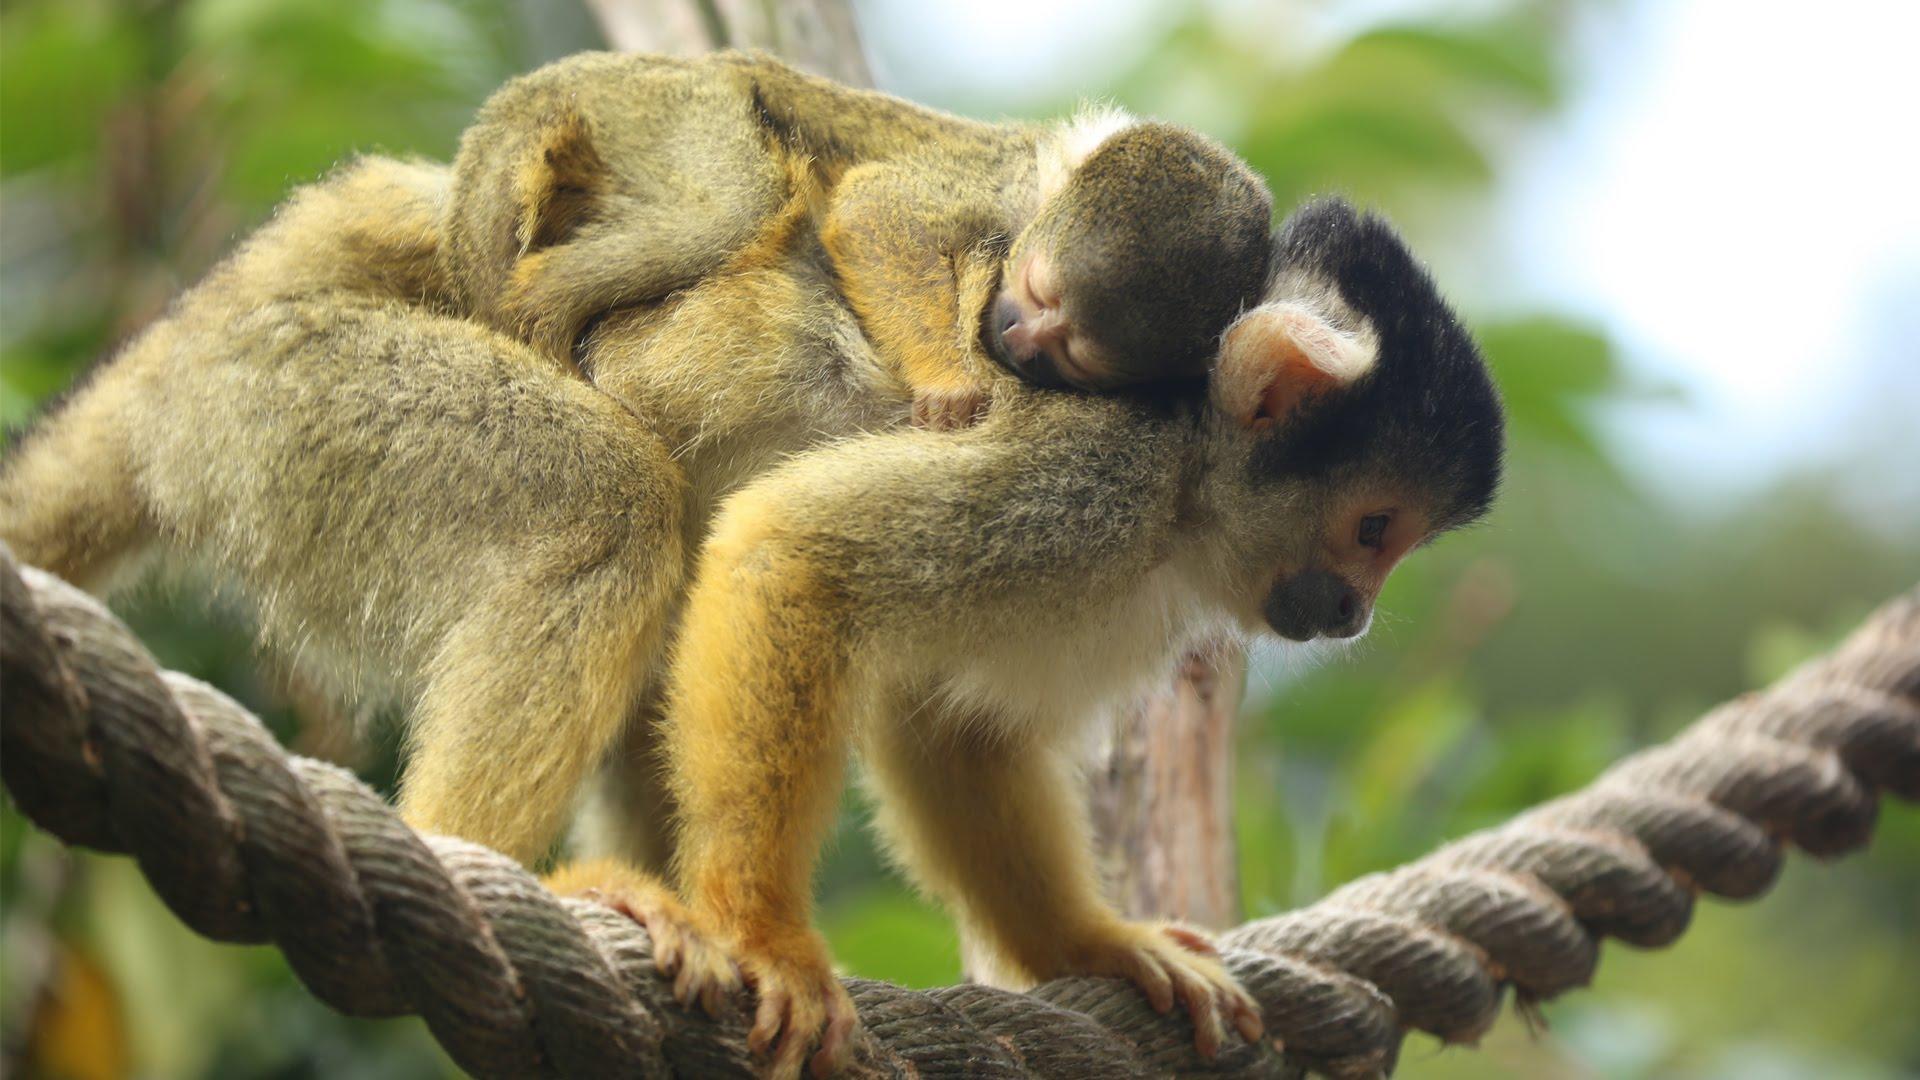 Squirrel Monkey Backgrounds, Compatible - PC, Mobile, Gadgets| 1920x1080 px